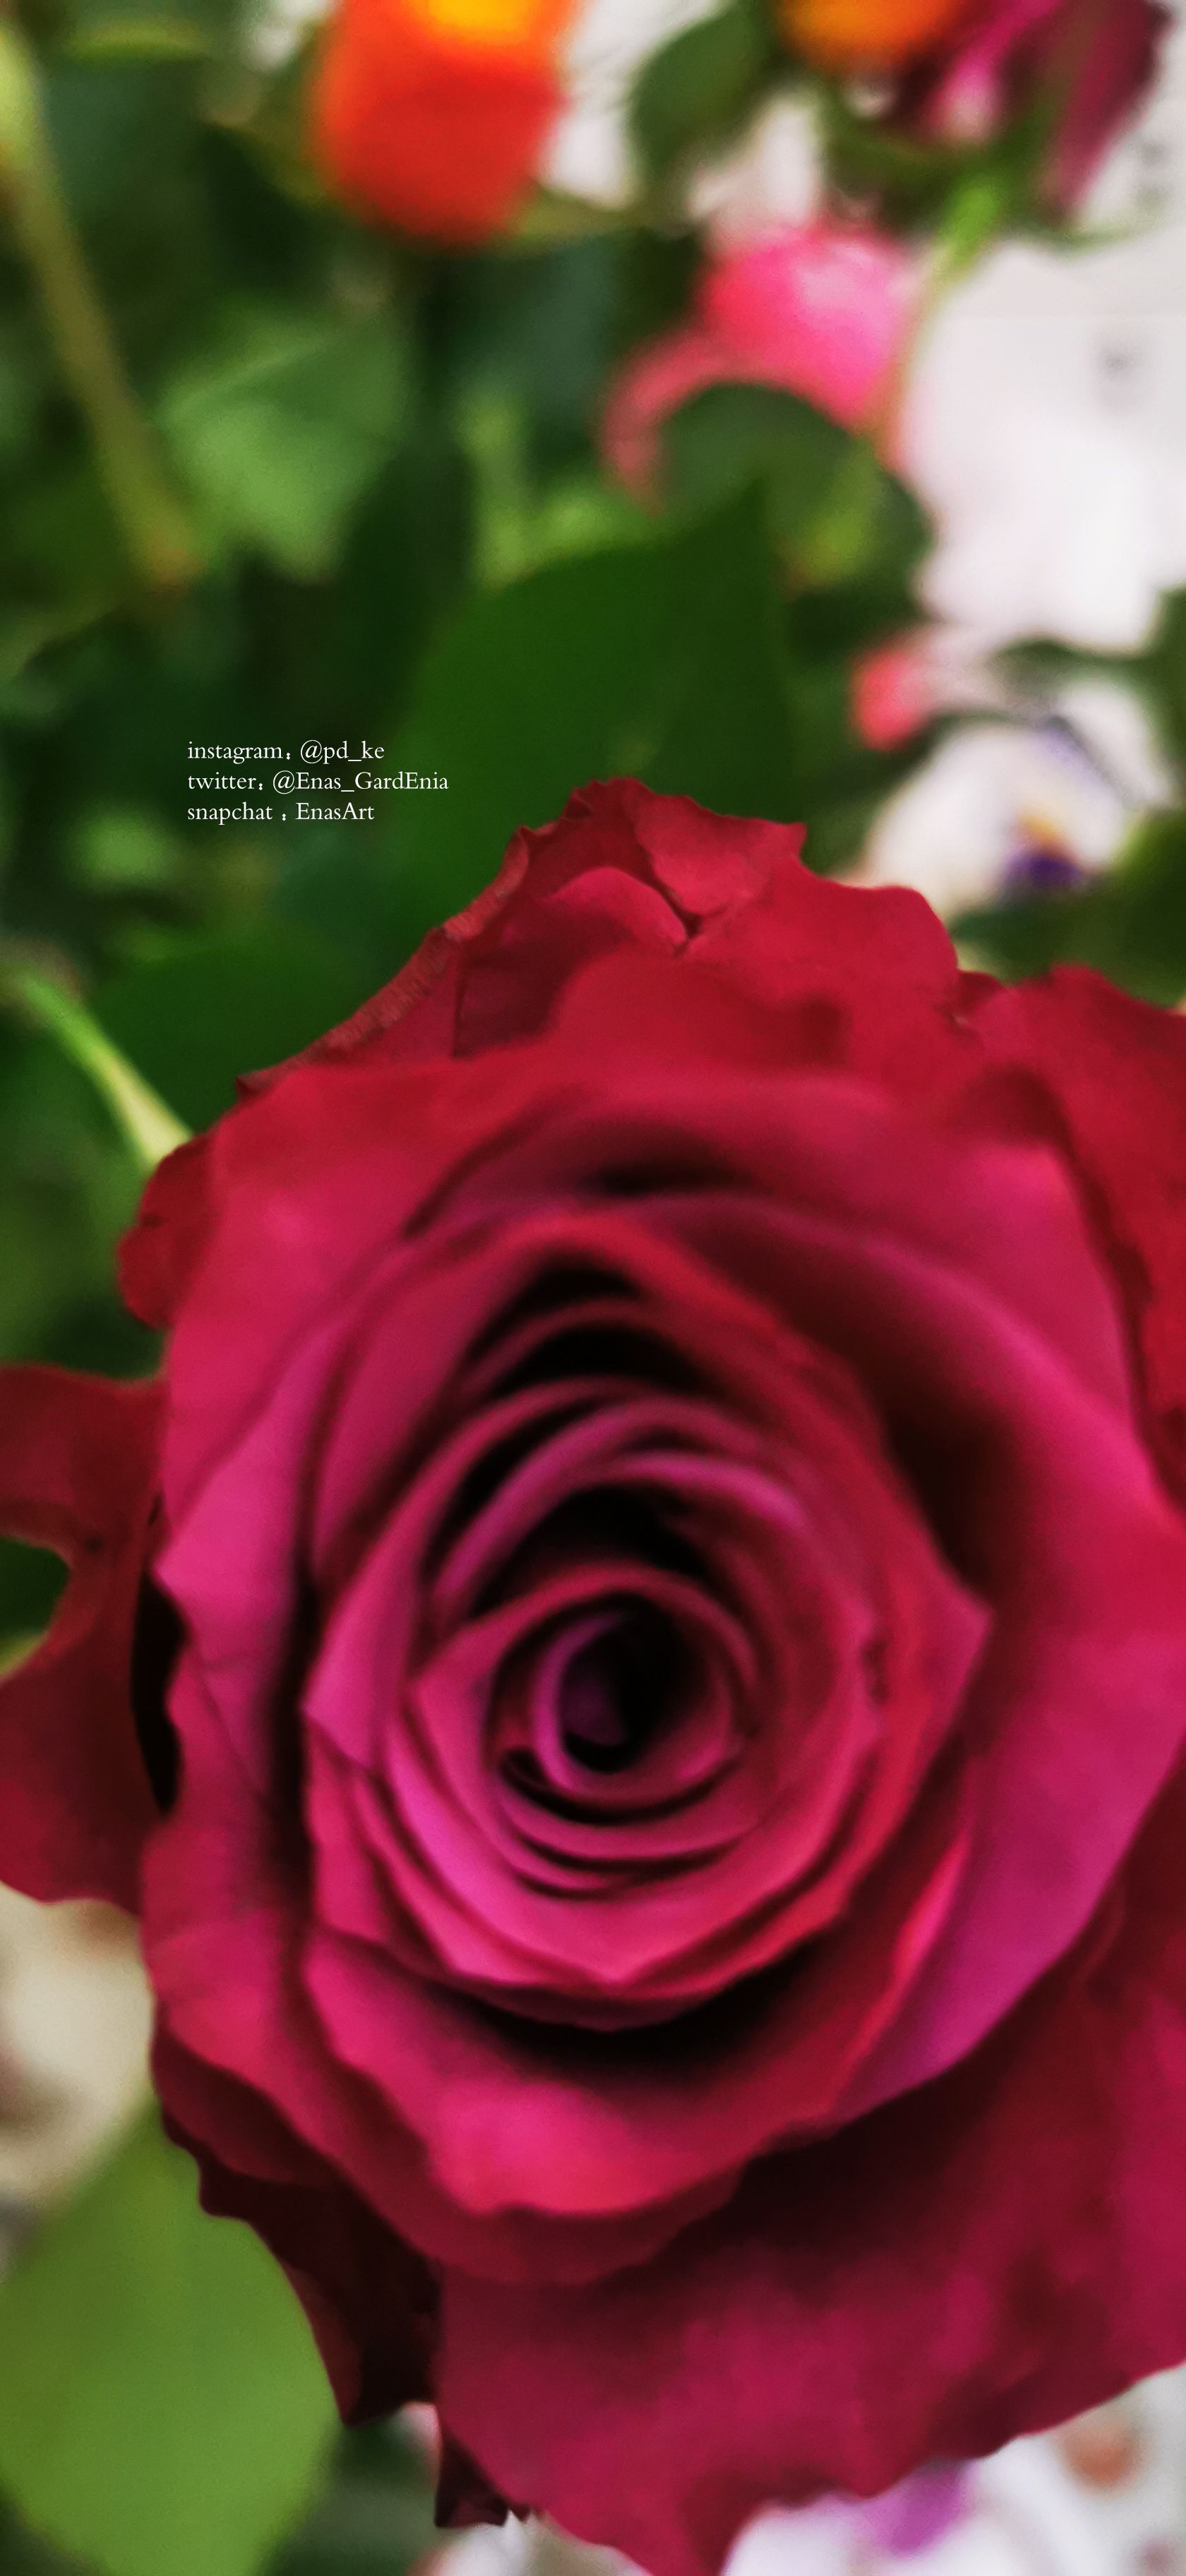 Instagram Pd Ke Twitter Enas Gardenia Snapchat Enasart Www Instagram Com Pd Ke تصويري ايناس الغاردينيا تصوير جوال تصوير السعود In 2020 Plants Rose Flowers